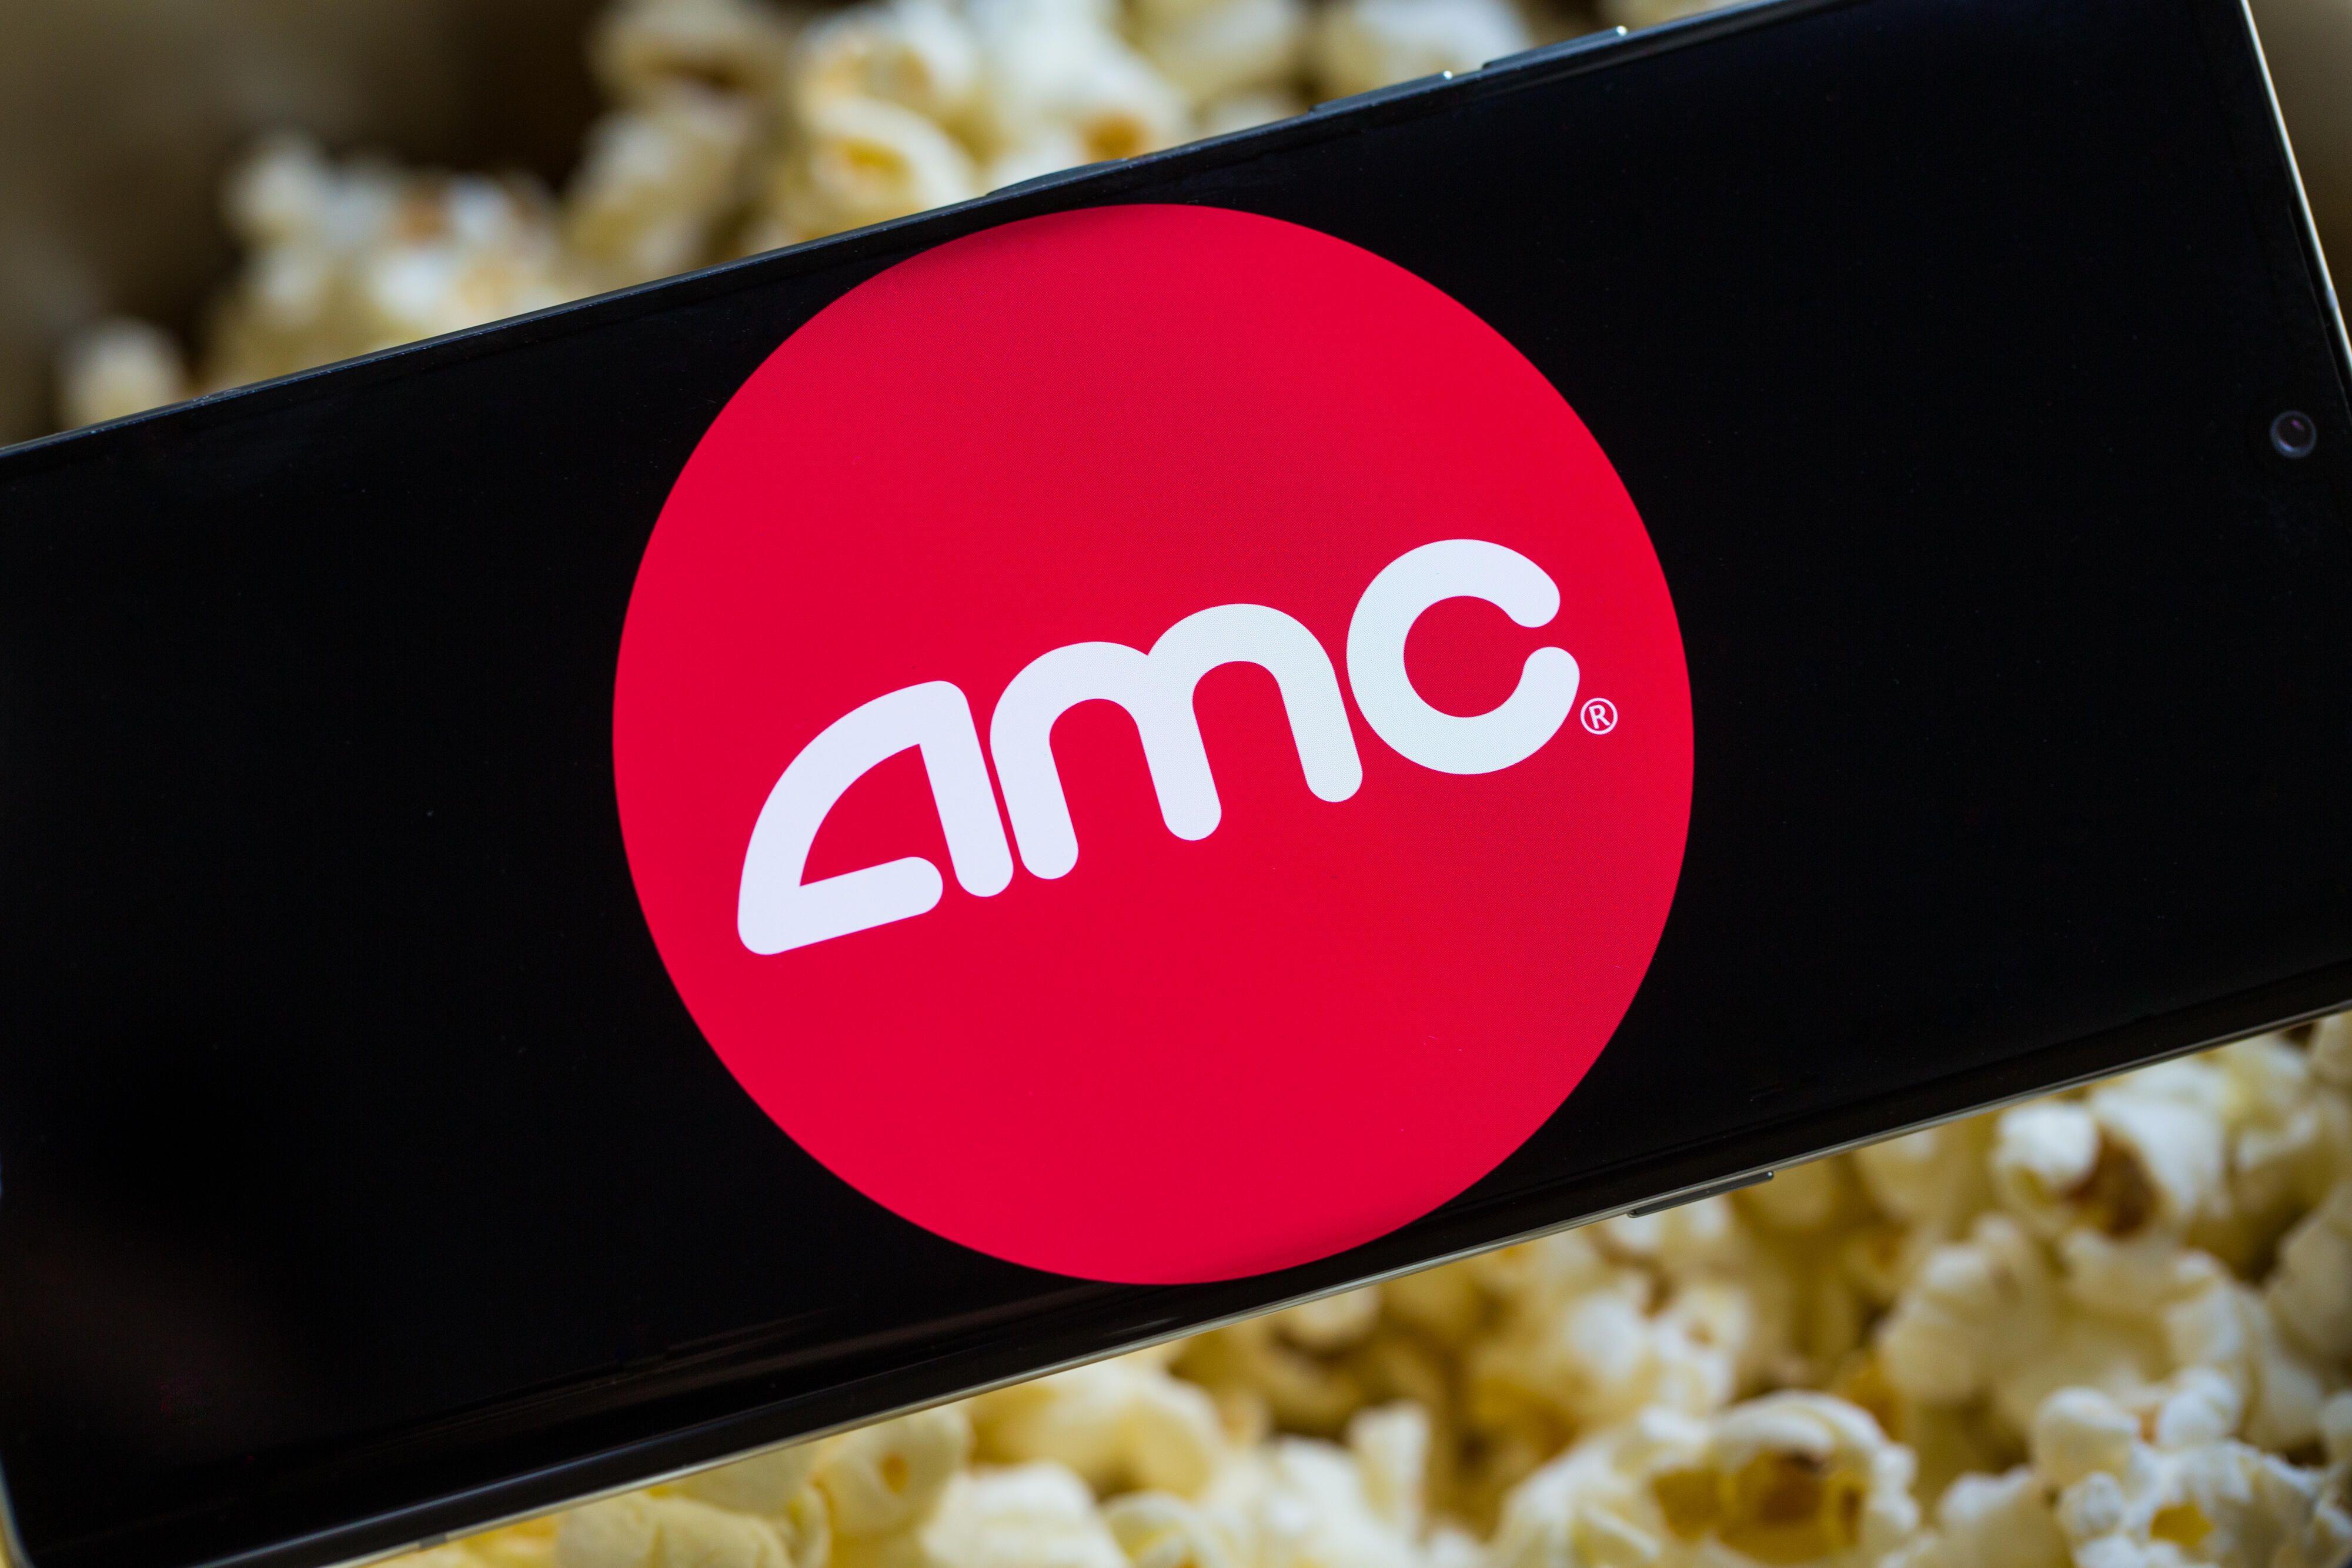 amc-logo-phone-popcorn-5967